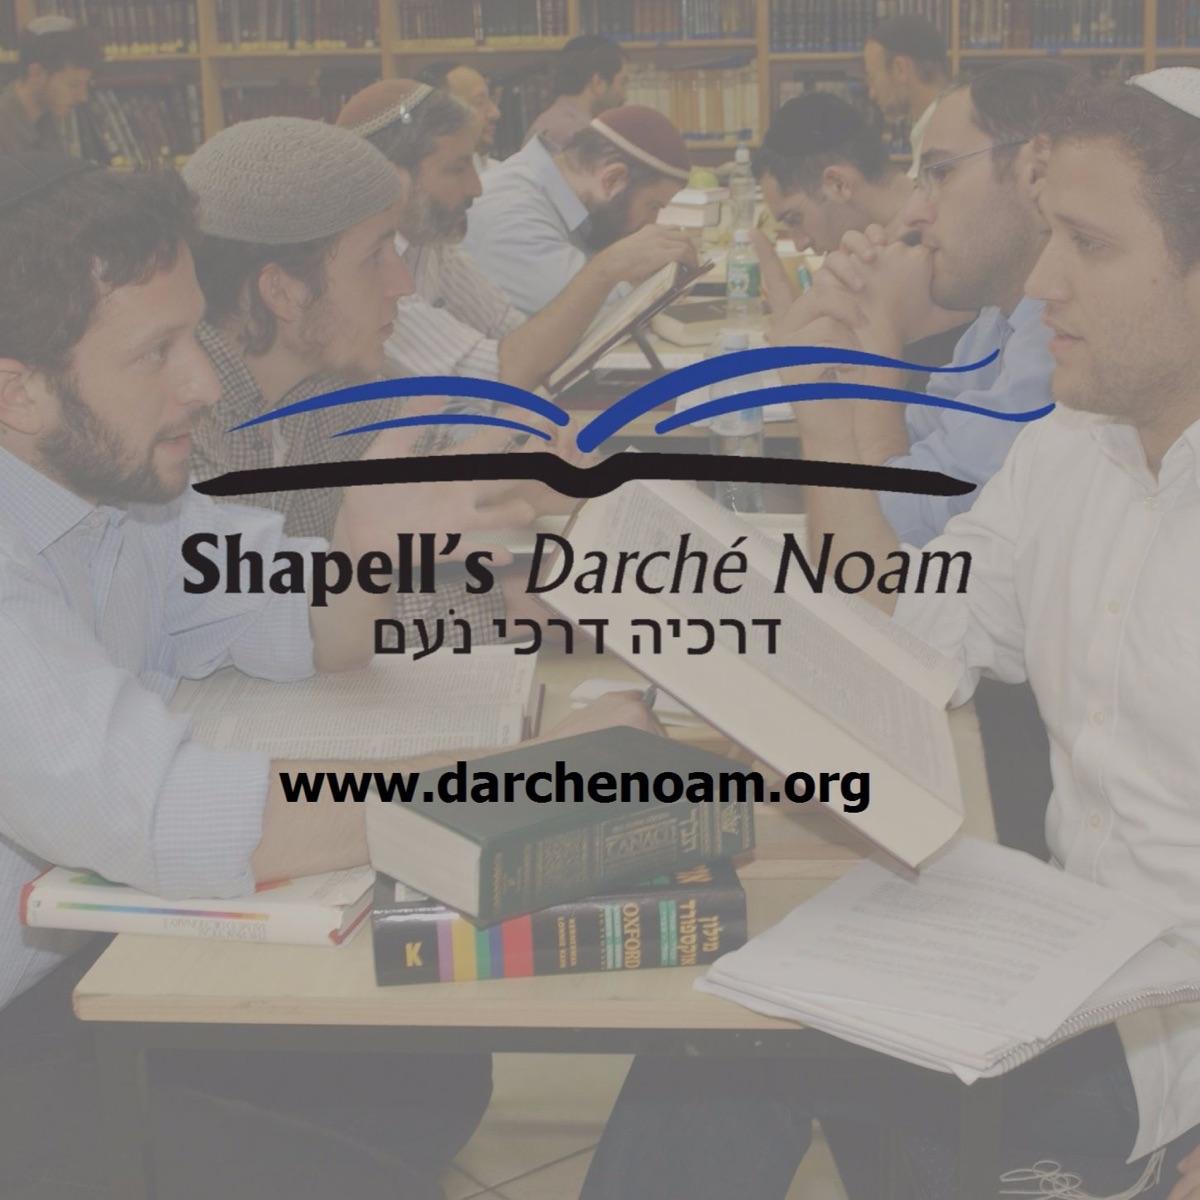 Shapell's/Darche Noam Podcast